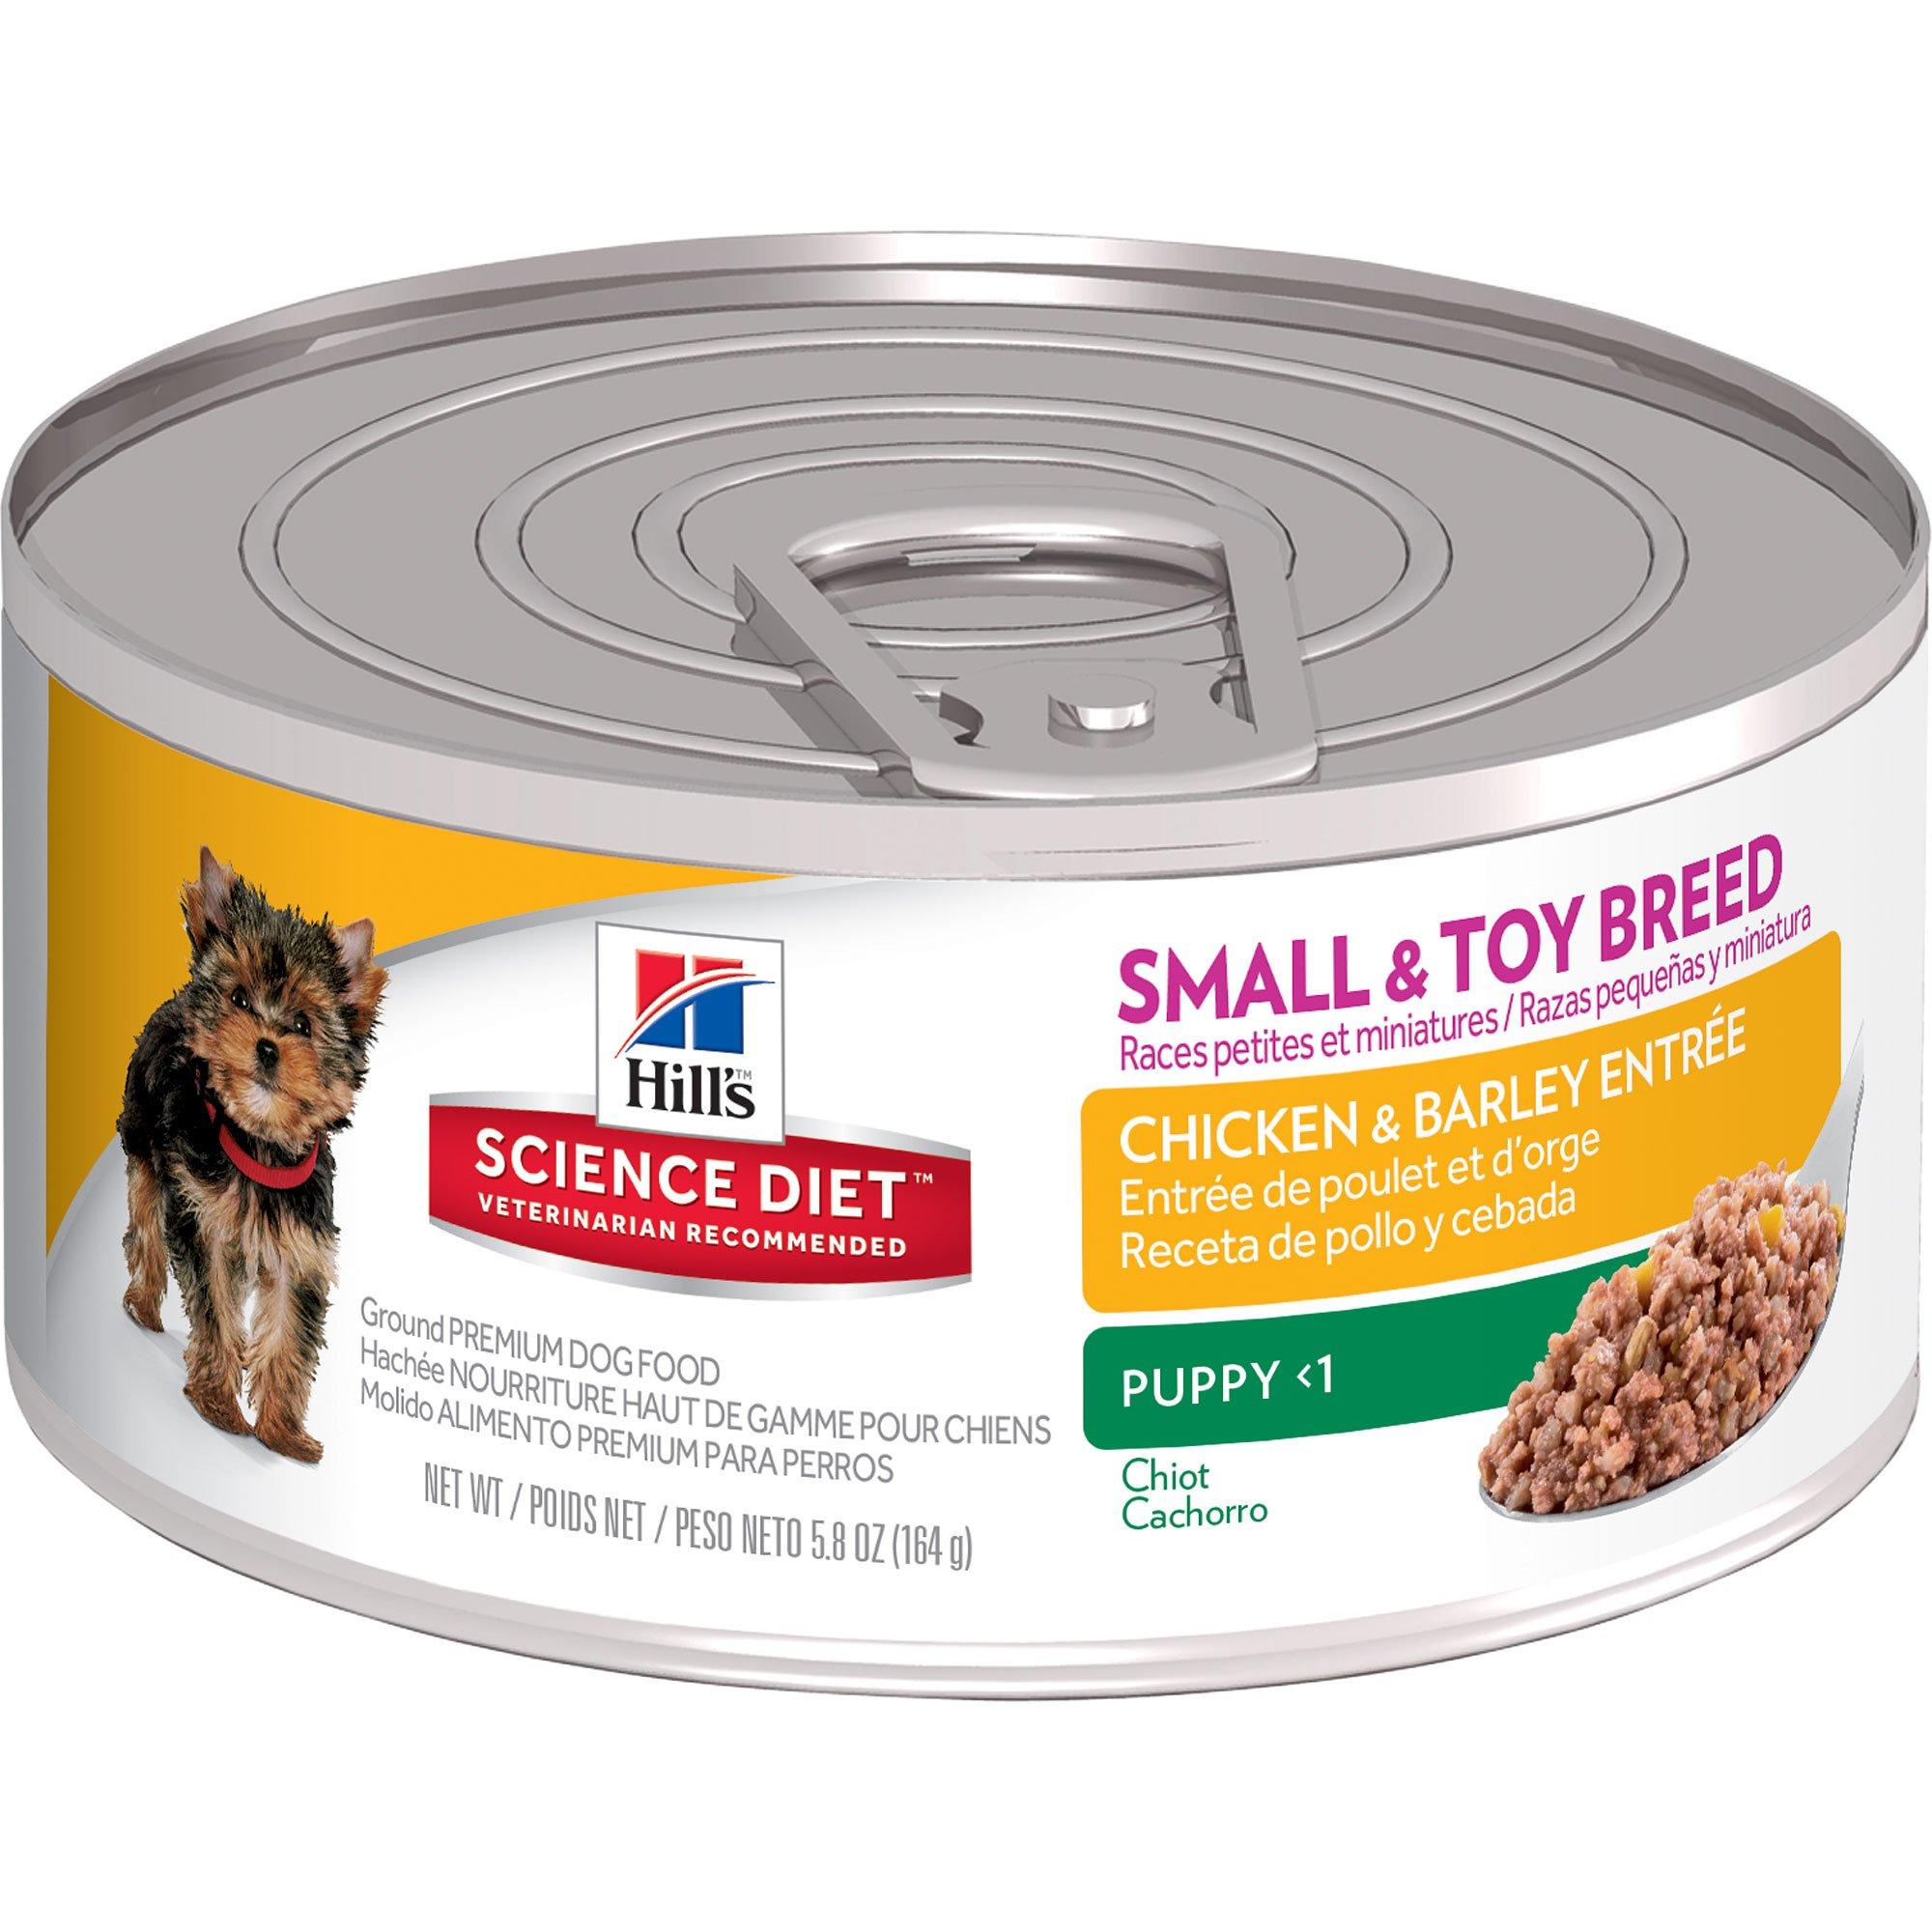 Science Diet Puppy Food Petco